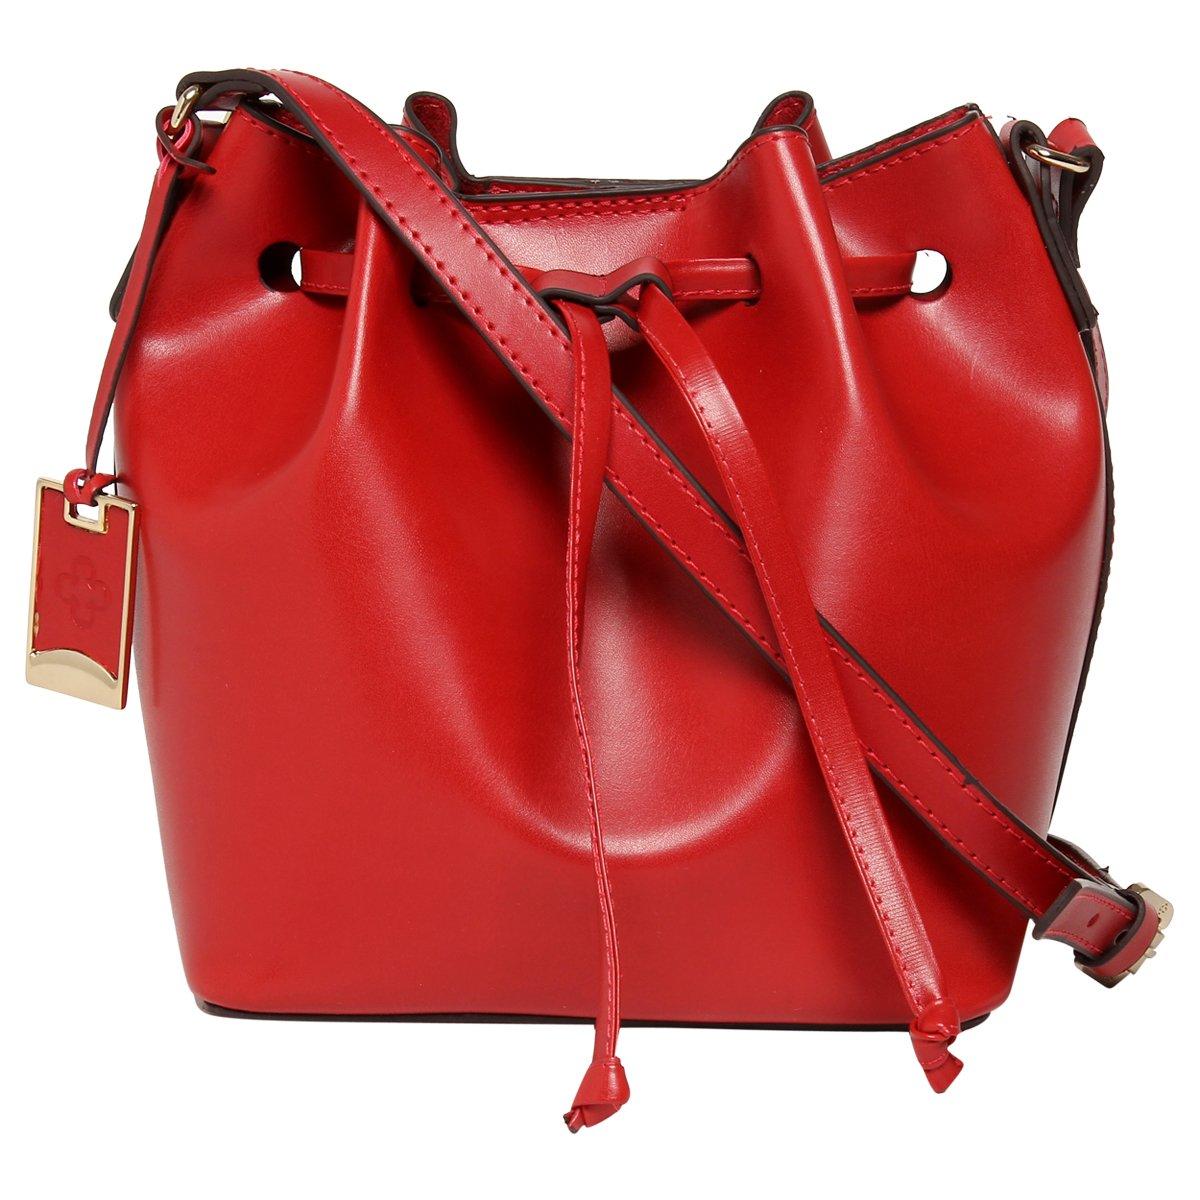 caed502d8 Bolsa Capodarte Saco - Compre Agora | Zattini